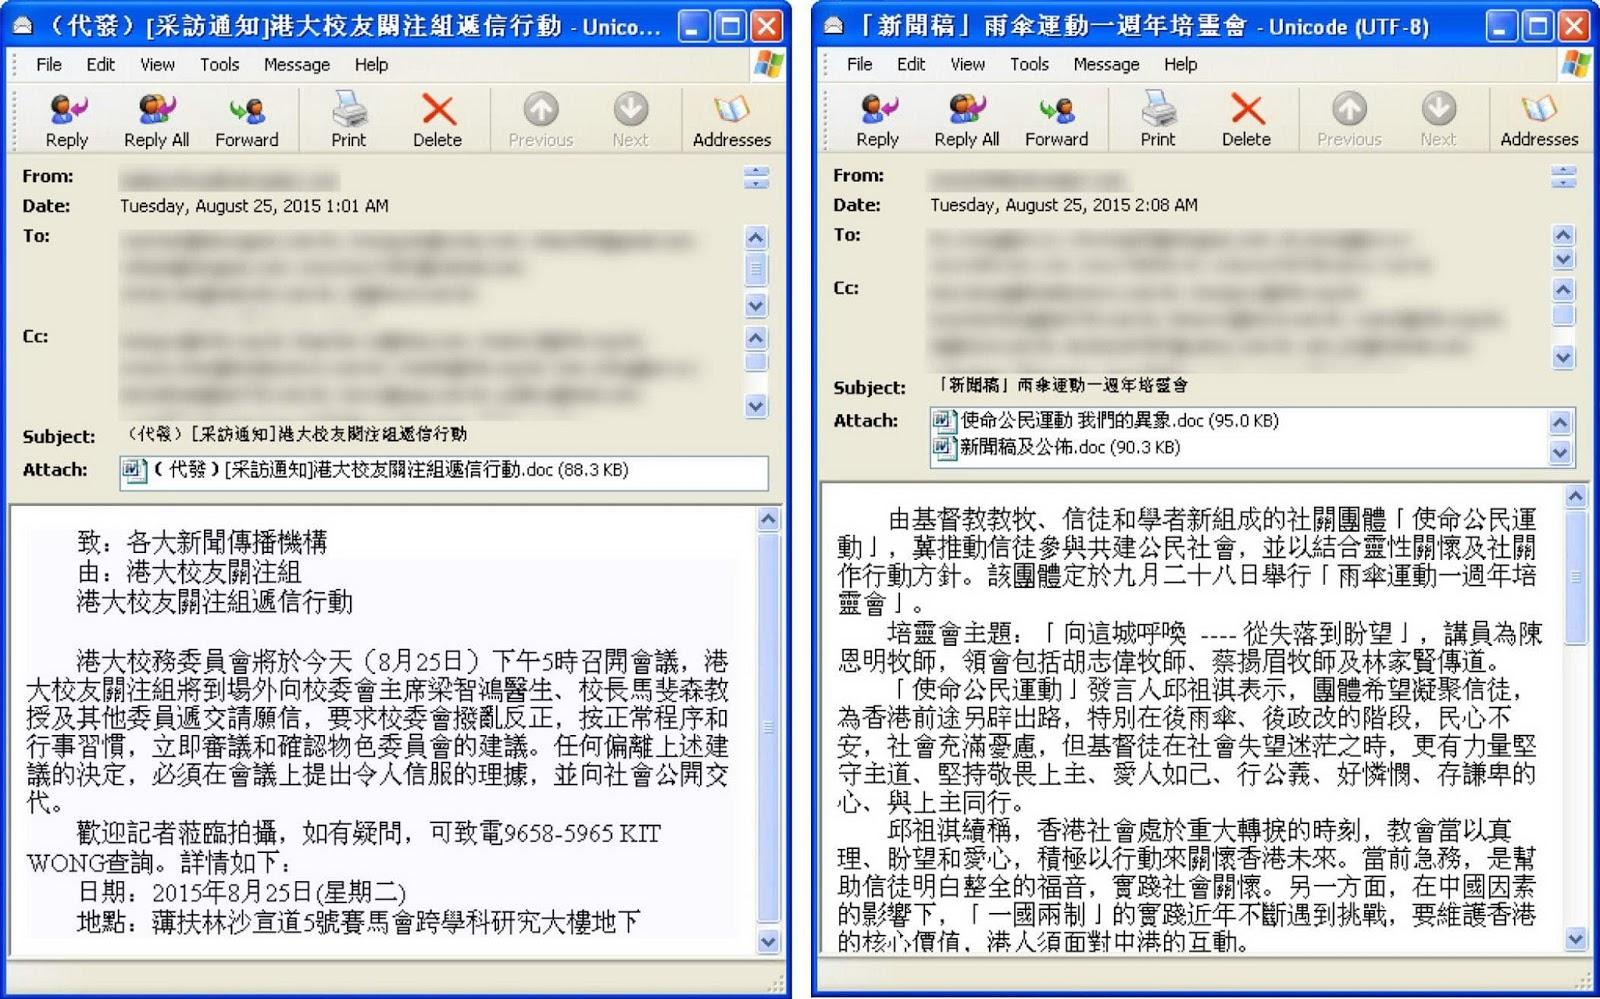 Gambar layar email spear phishing yang dikirim oleh admin@338 kepada jurnalis.